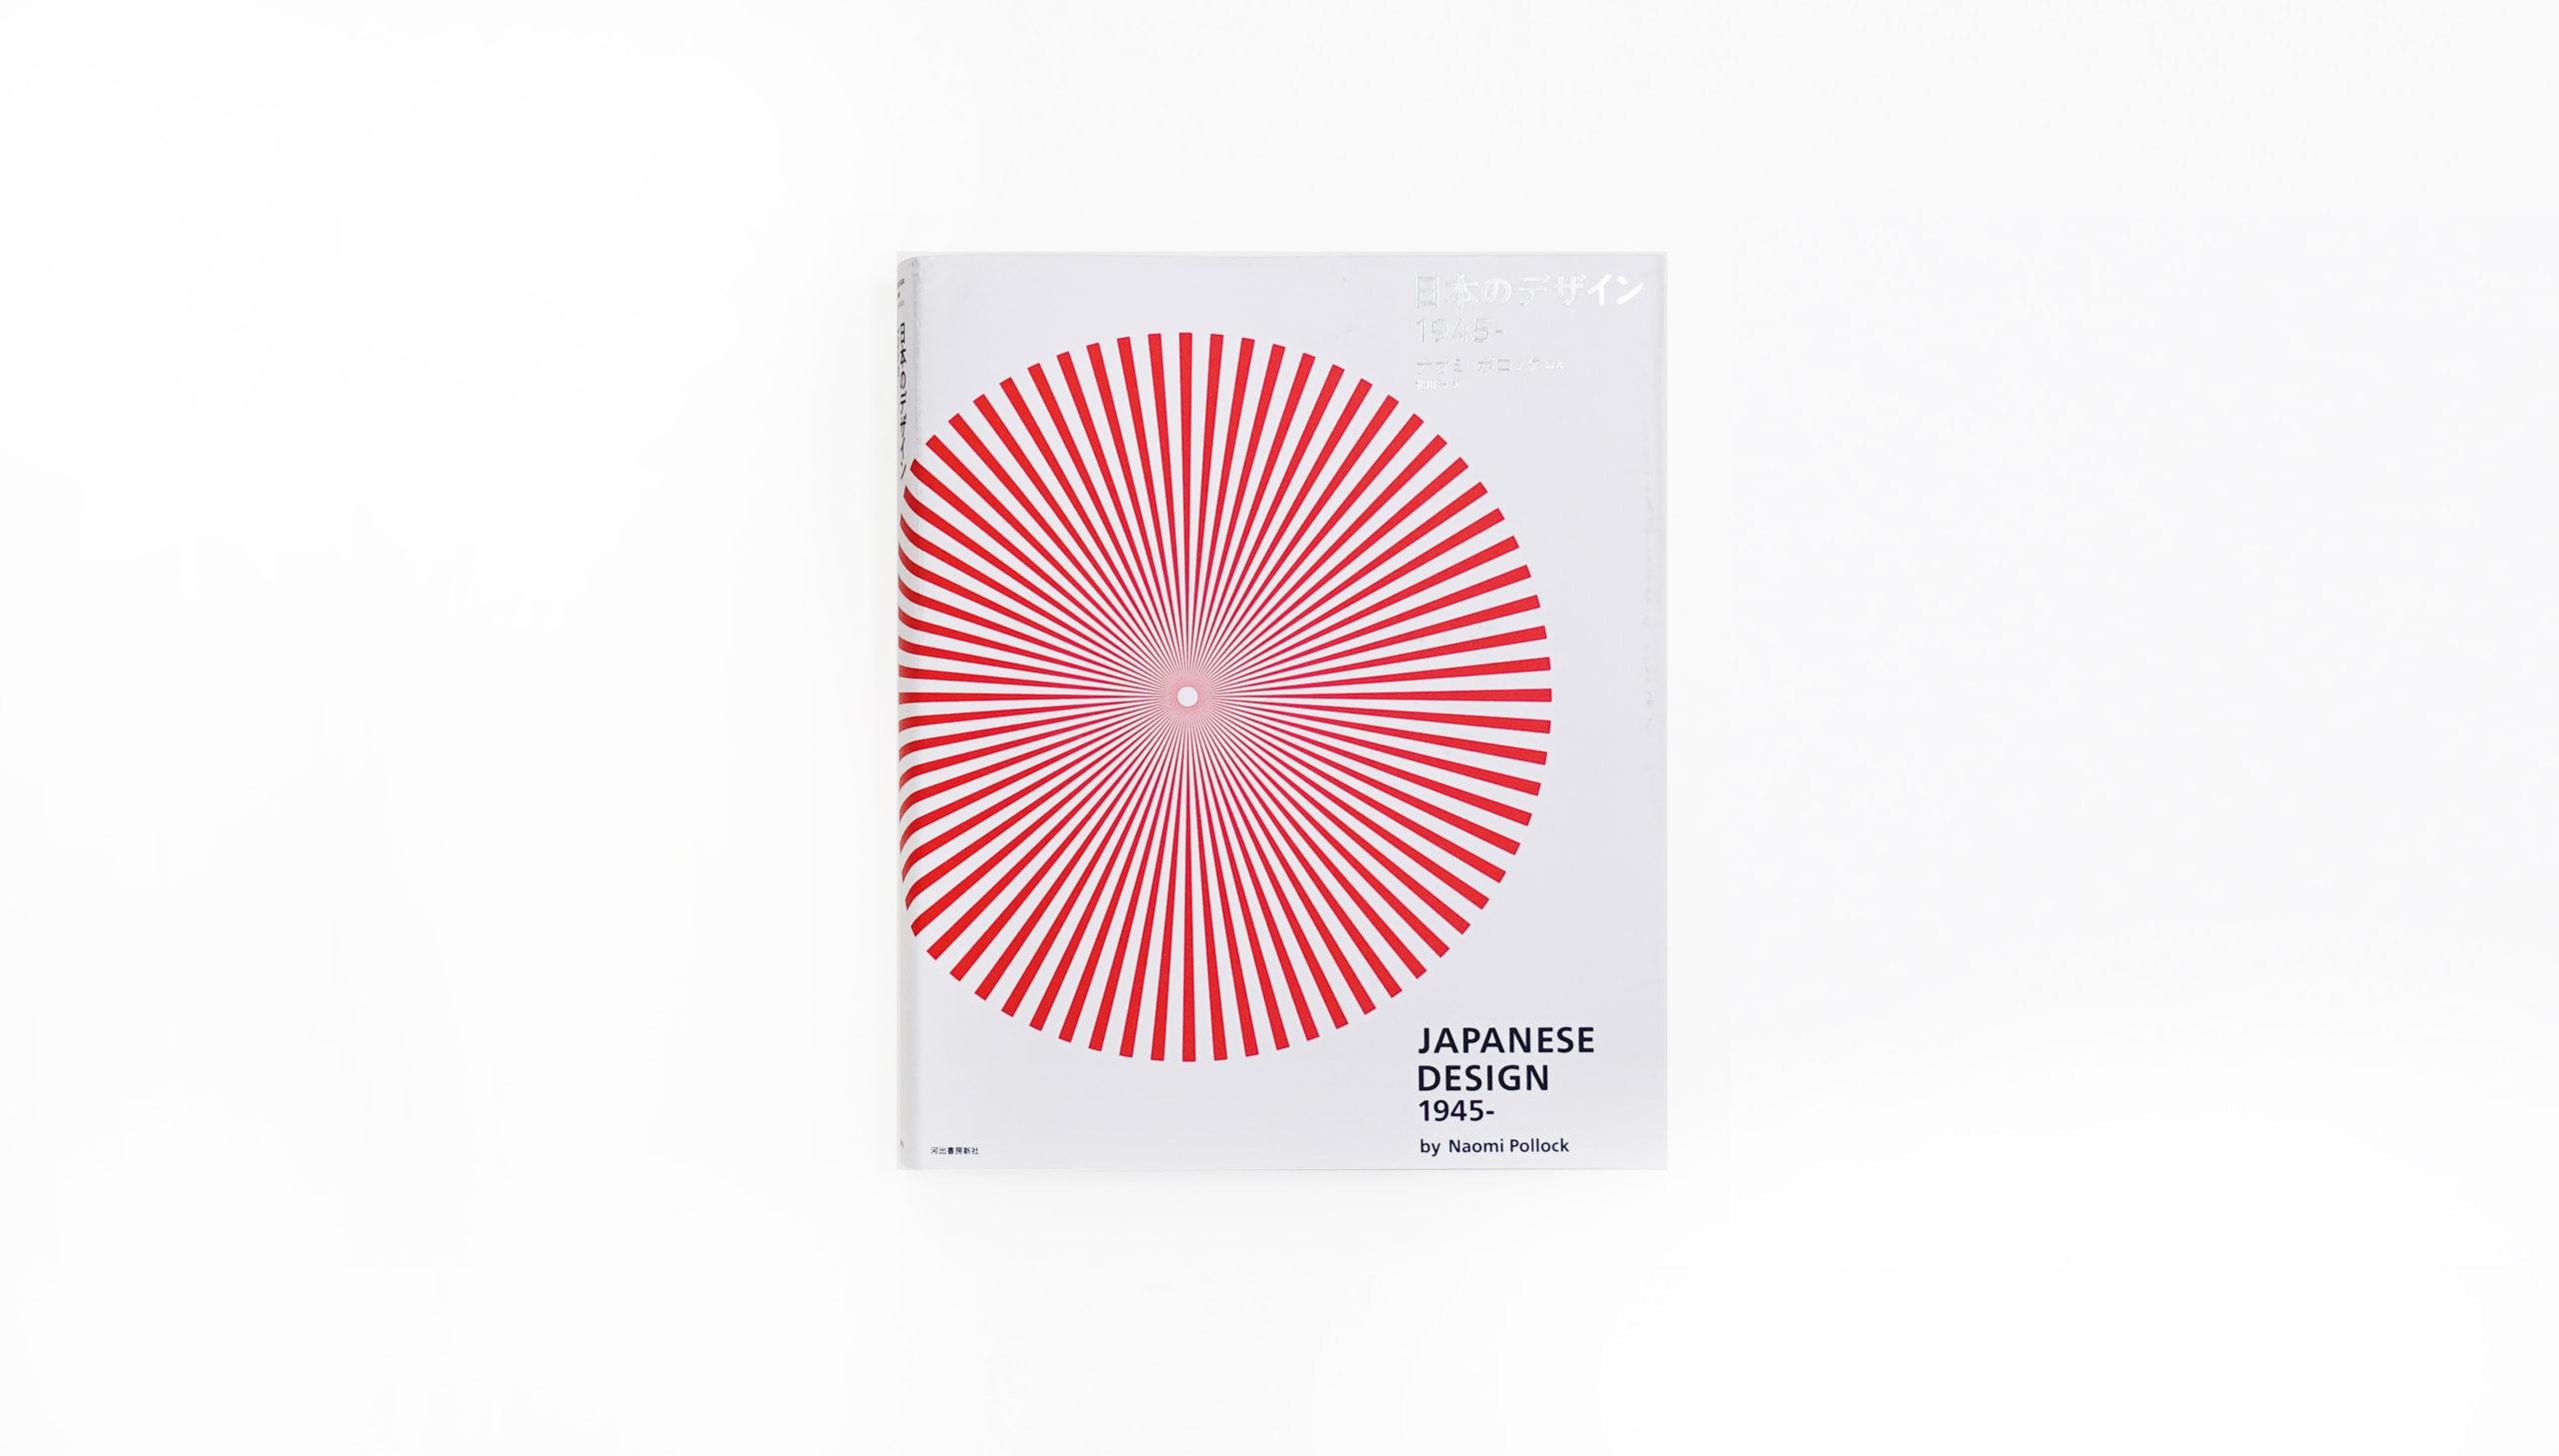 Japanese Design 1945-  October / 2020